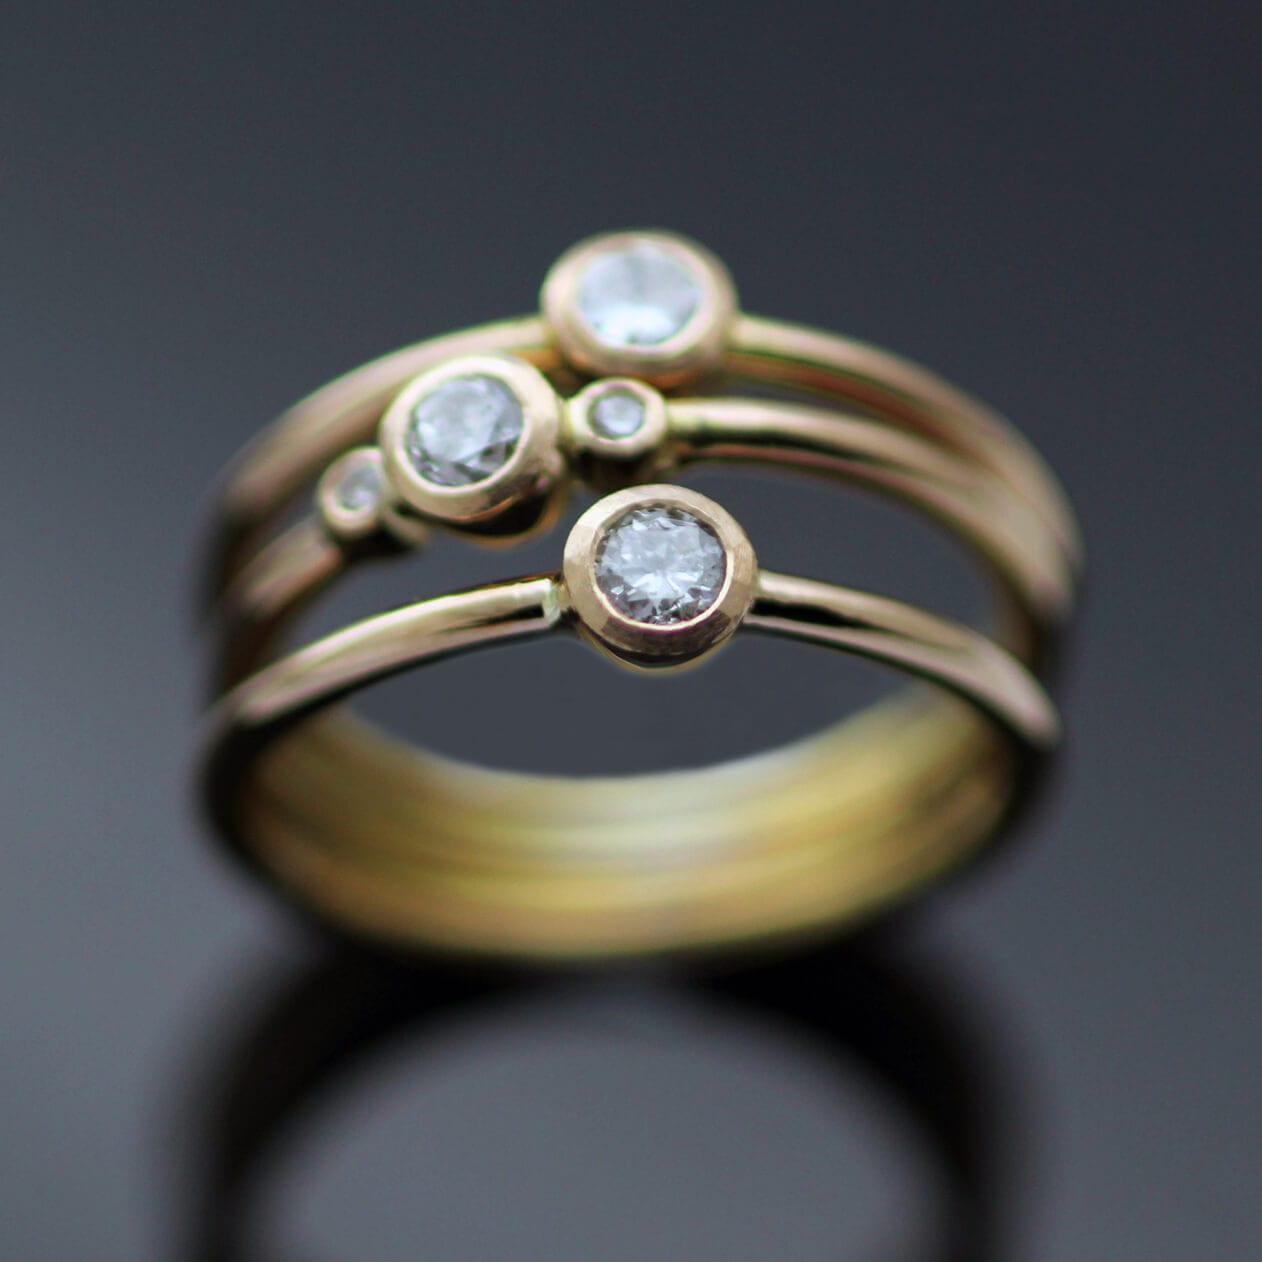 Handmade bespoke stacking engagement rings Rose Gold Diamonds